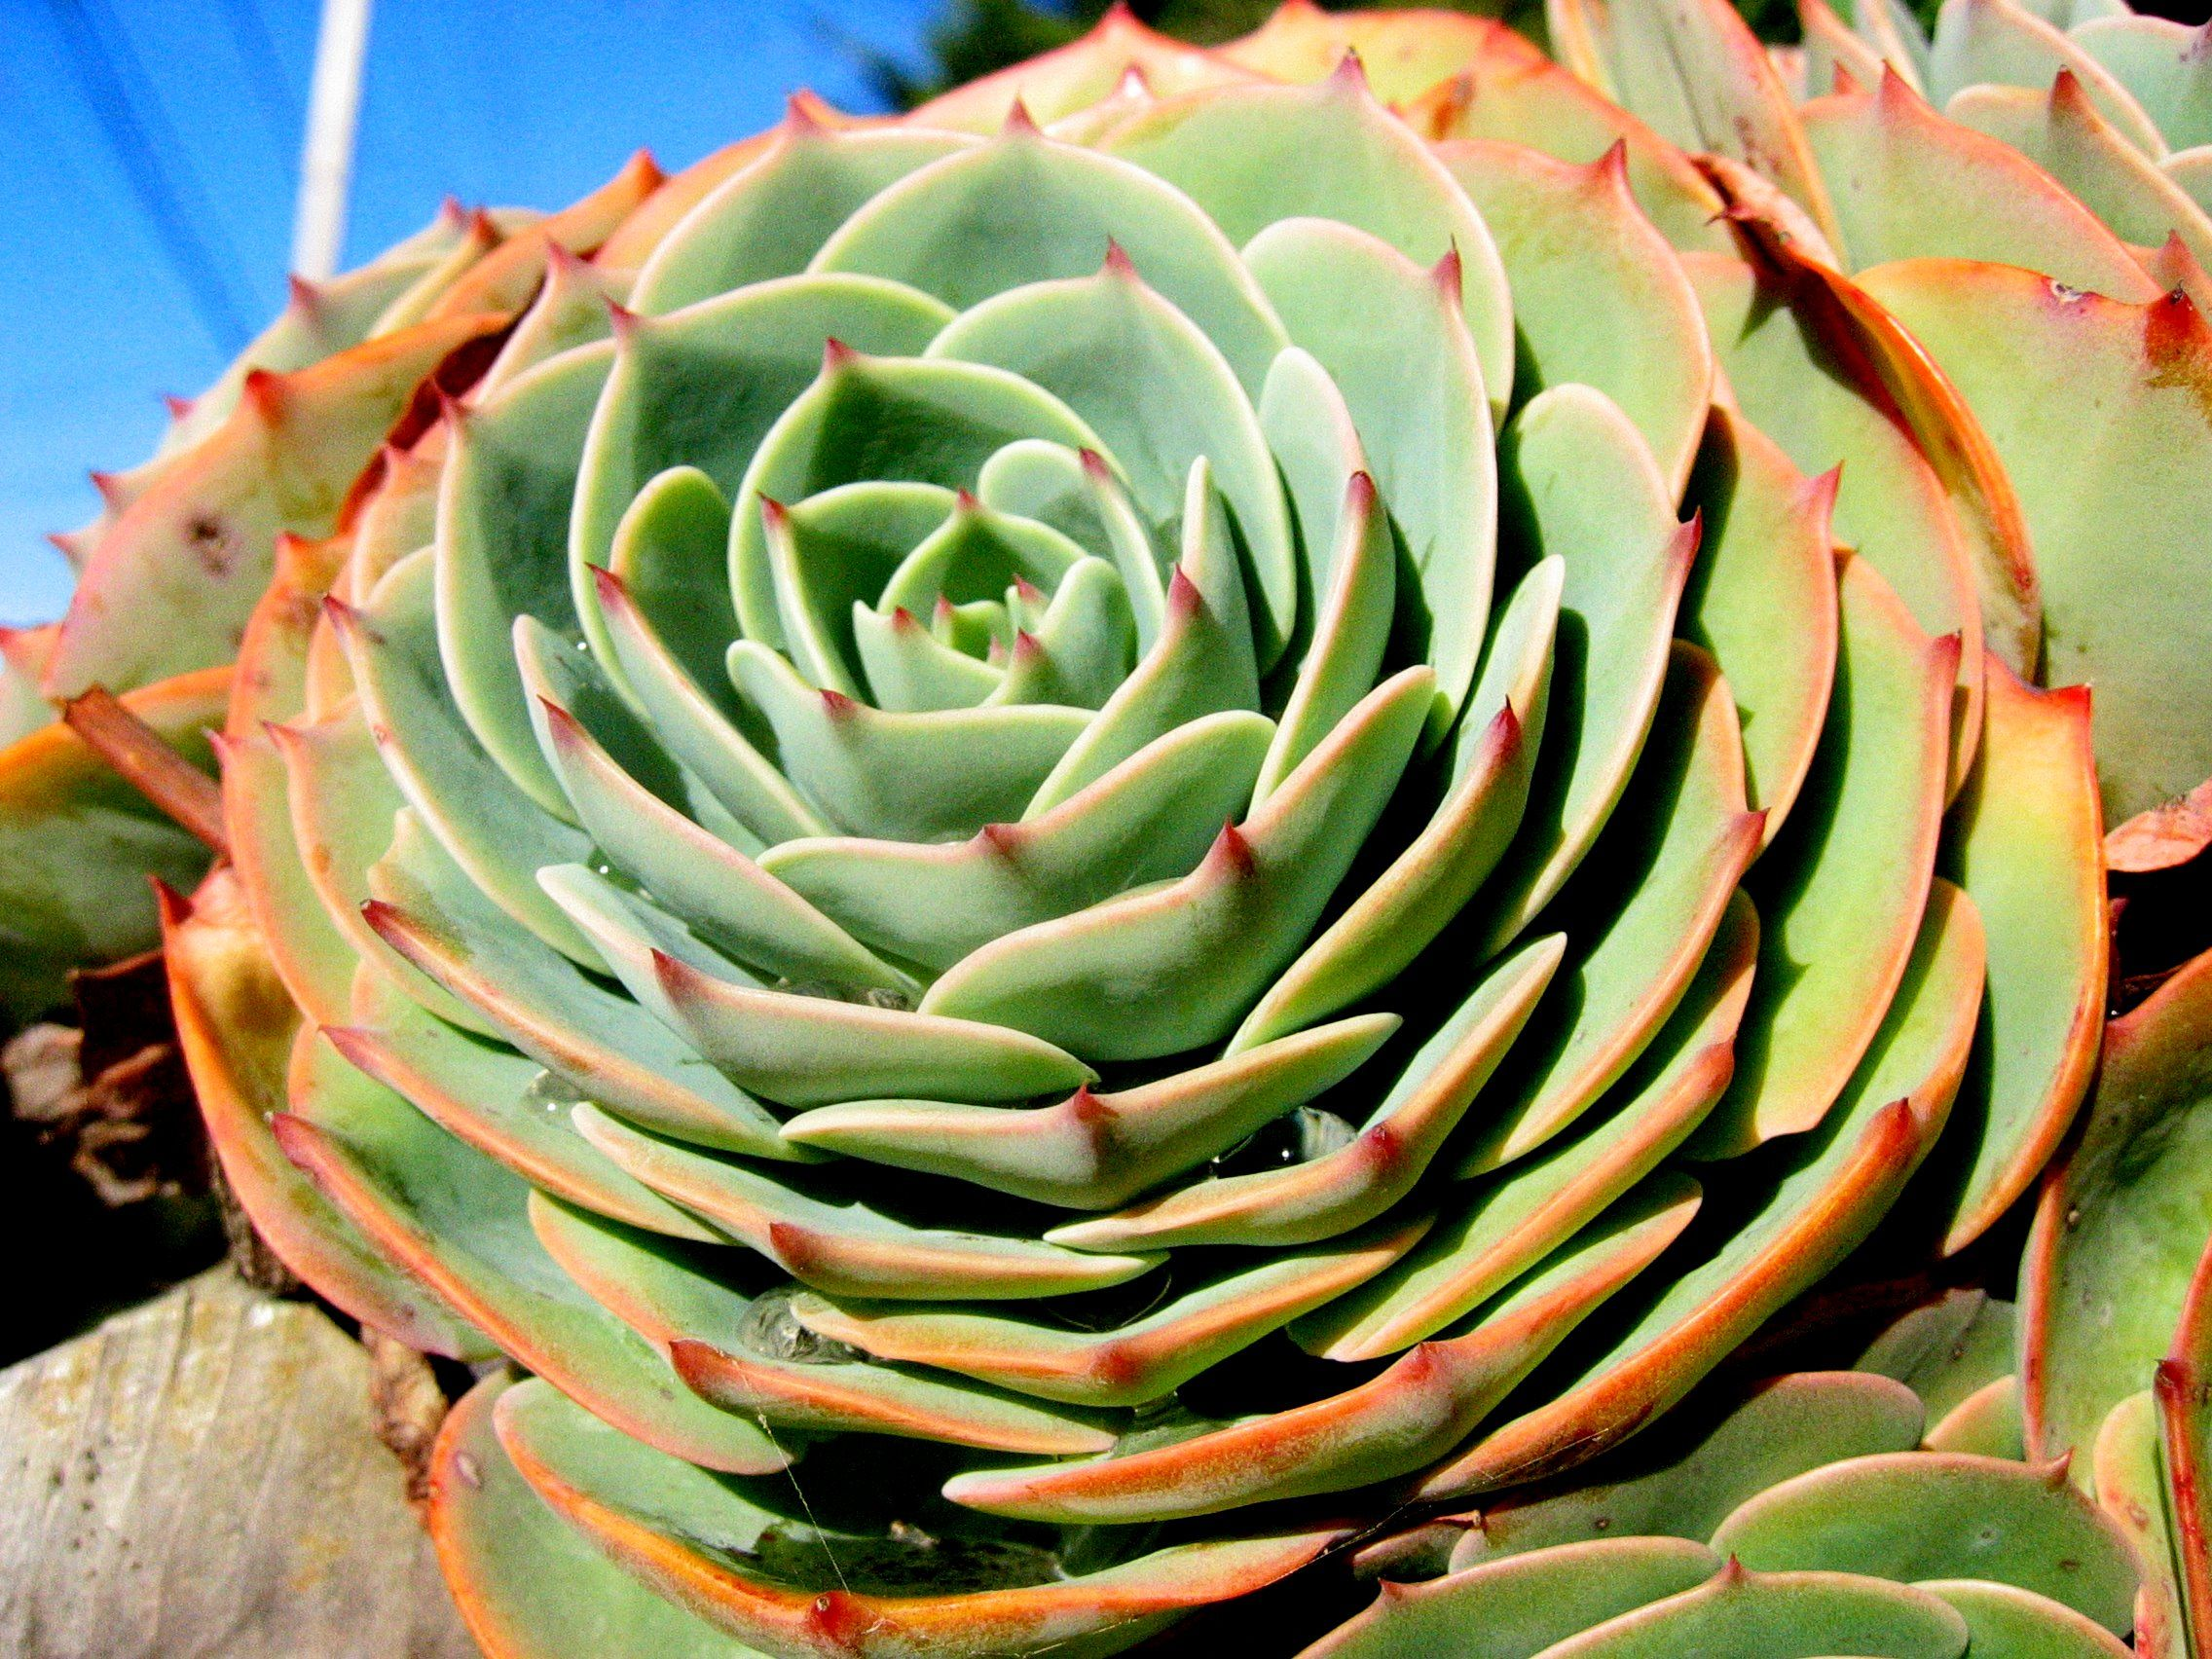 Imagenes de cactus cacti plants and gardens for Fotos de cactus